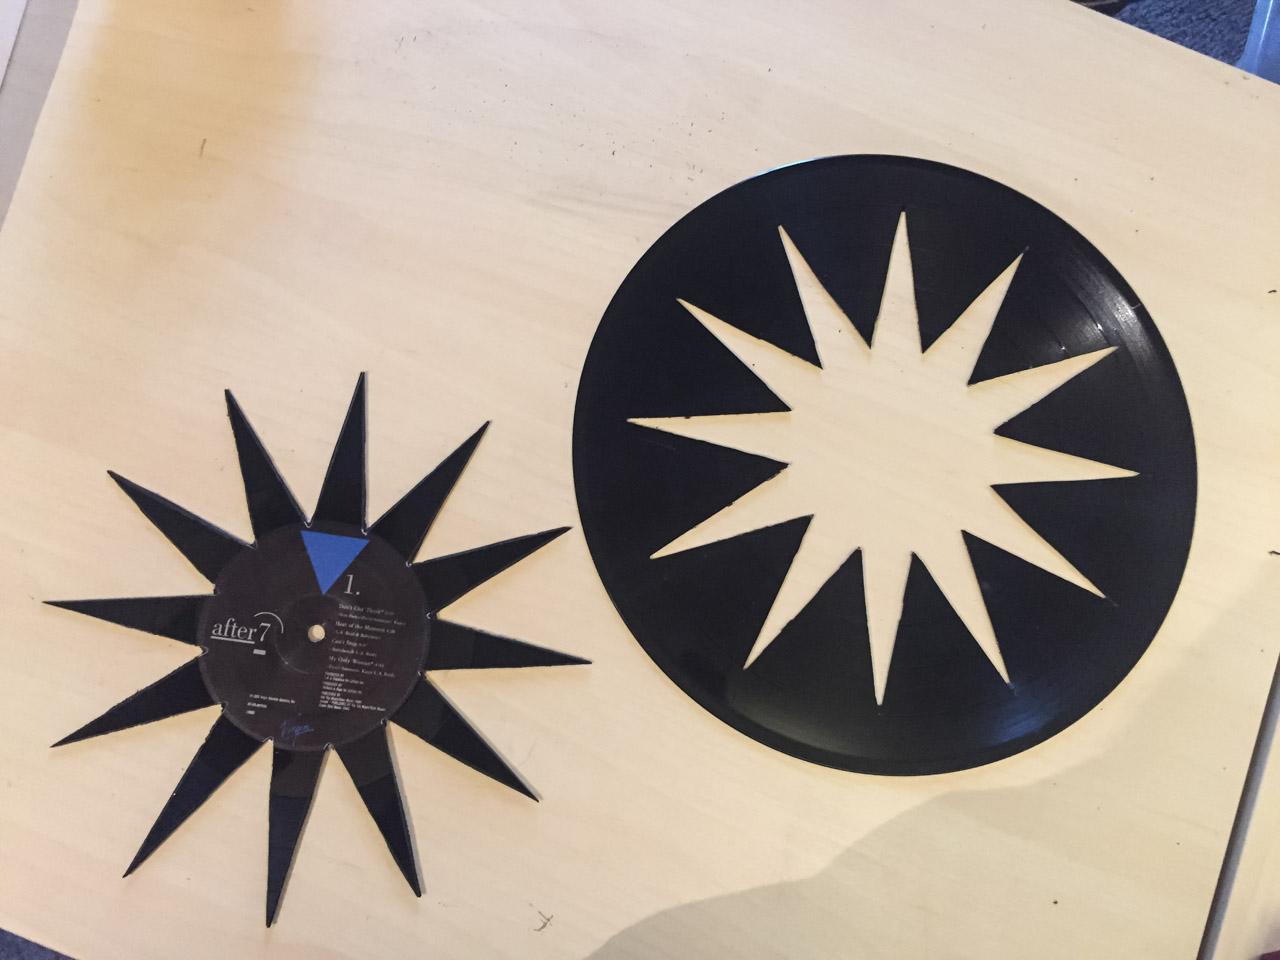 Cutting A Vinyl Record On The Knk Force Cutterpunk Crafts